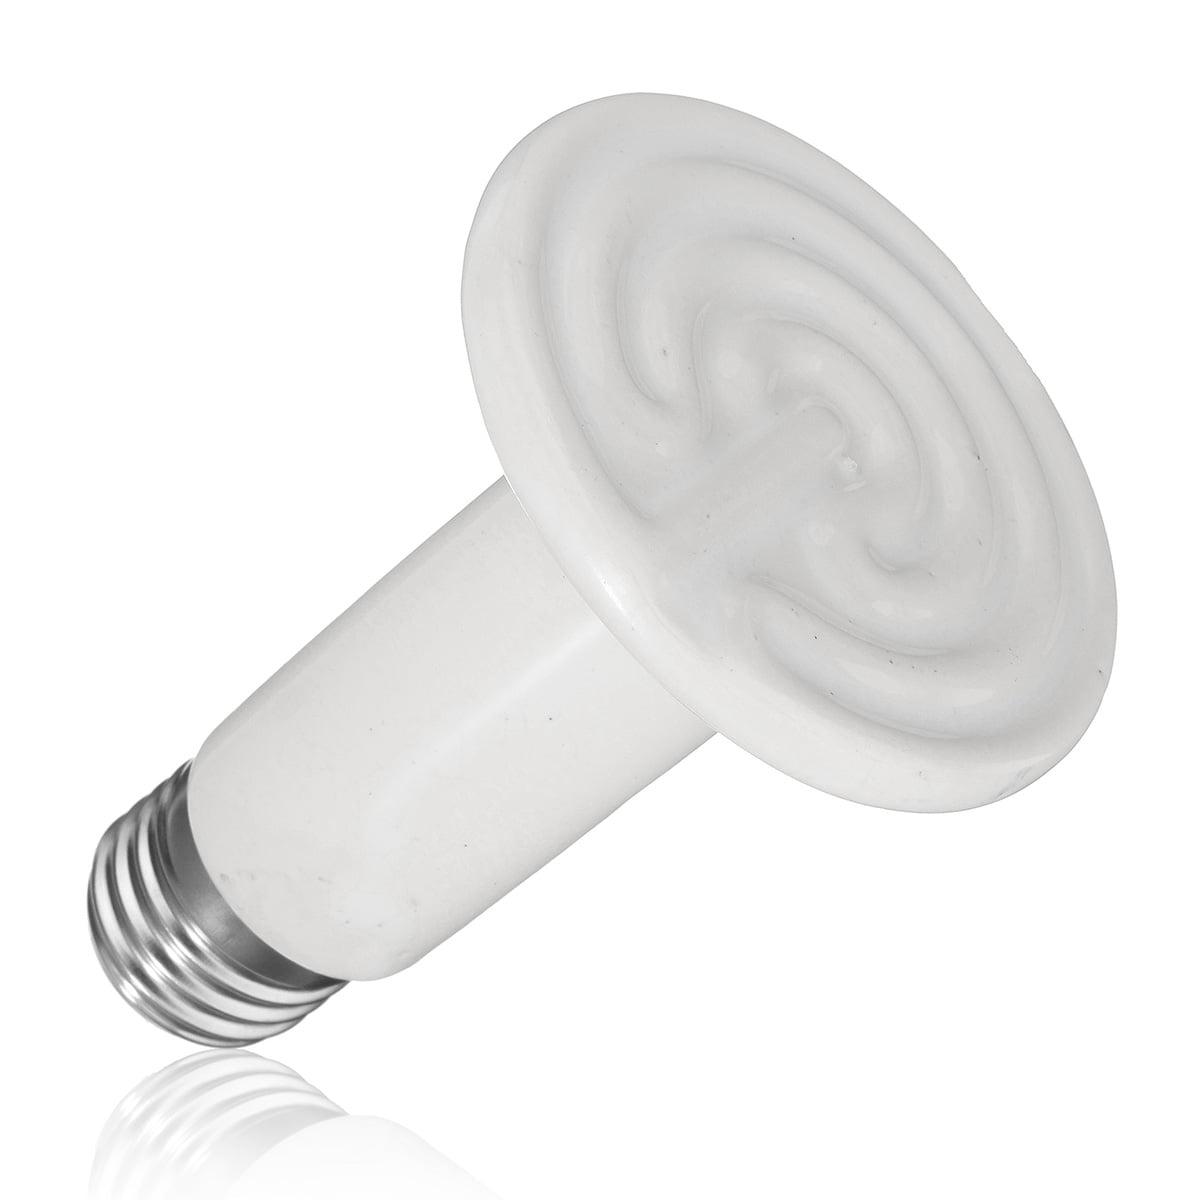 25w 50w 75w Ei Licht 100w 110v Infrared Ceramic Heat Lamp Reptile Emitter Lamp Bulb For Pet